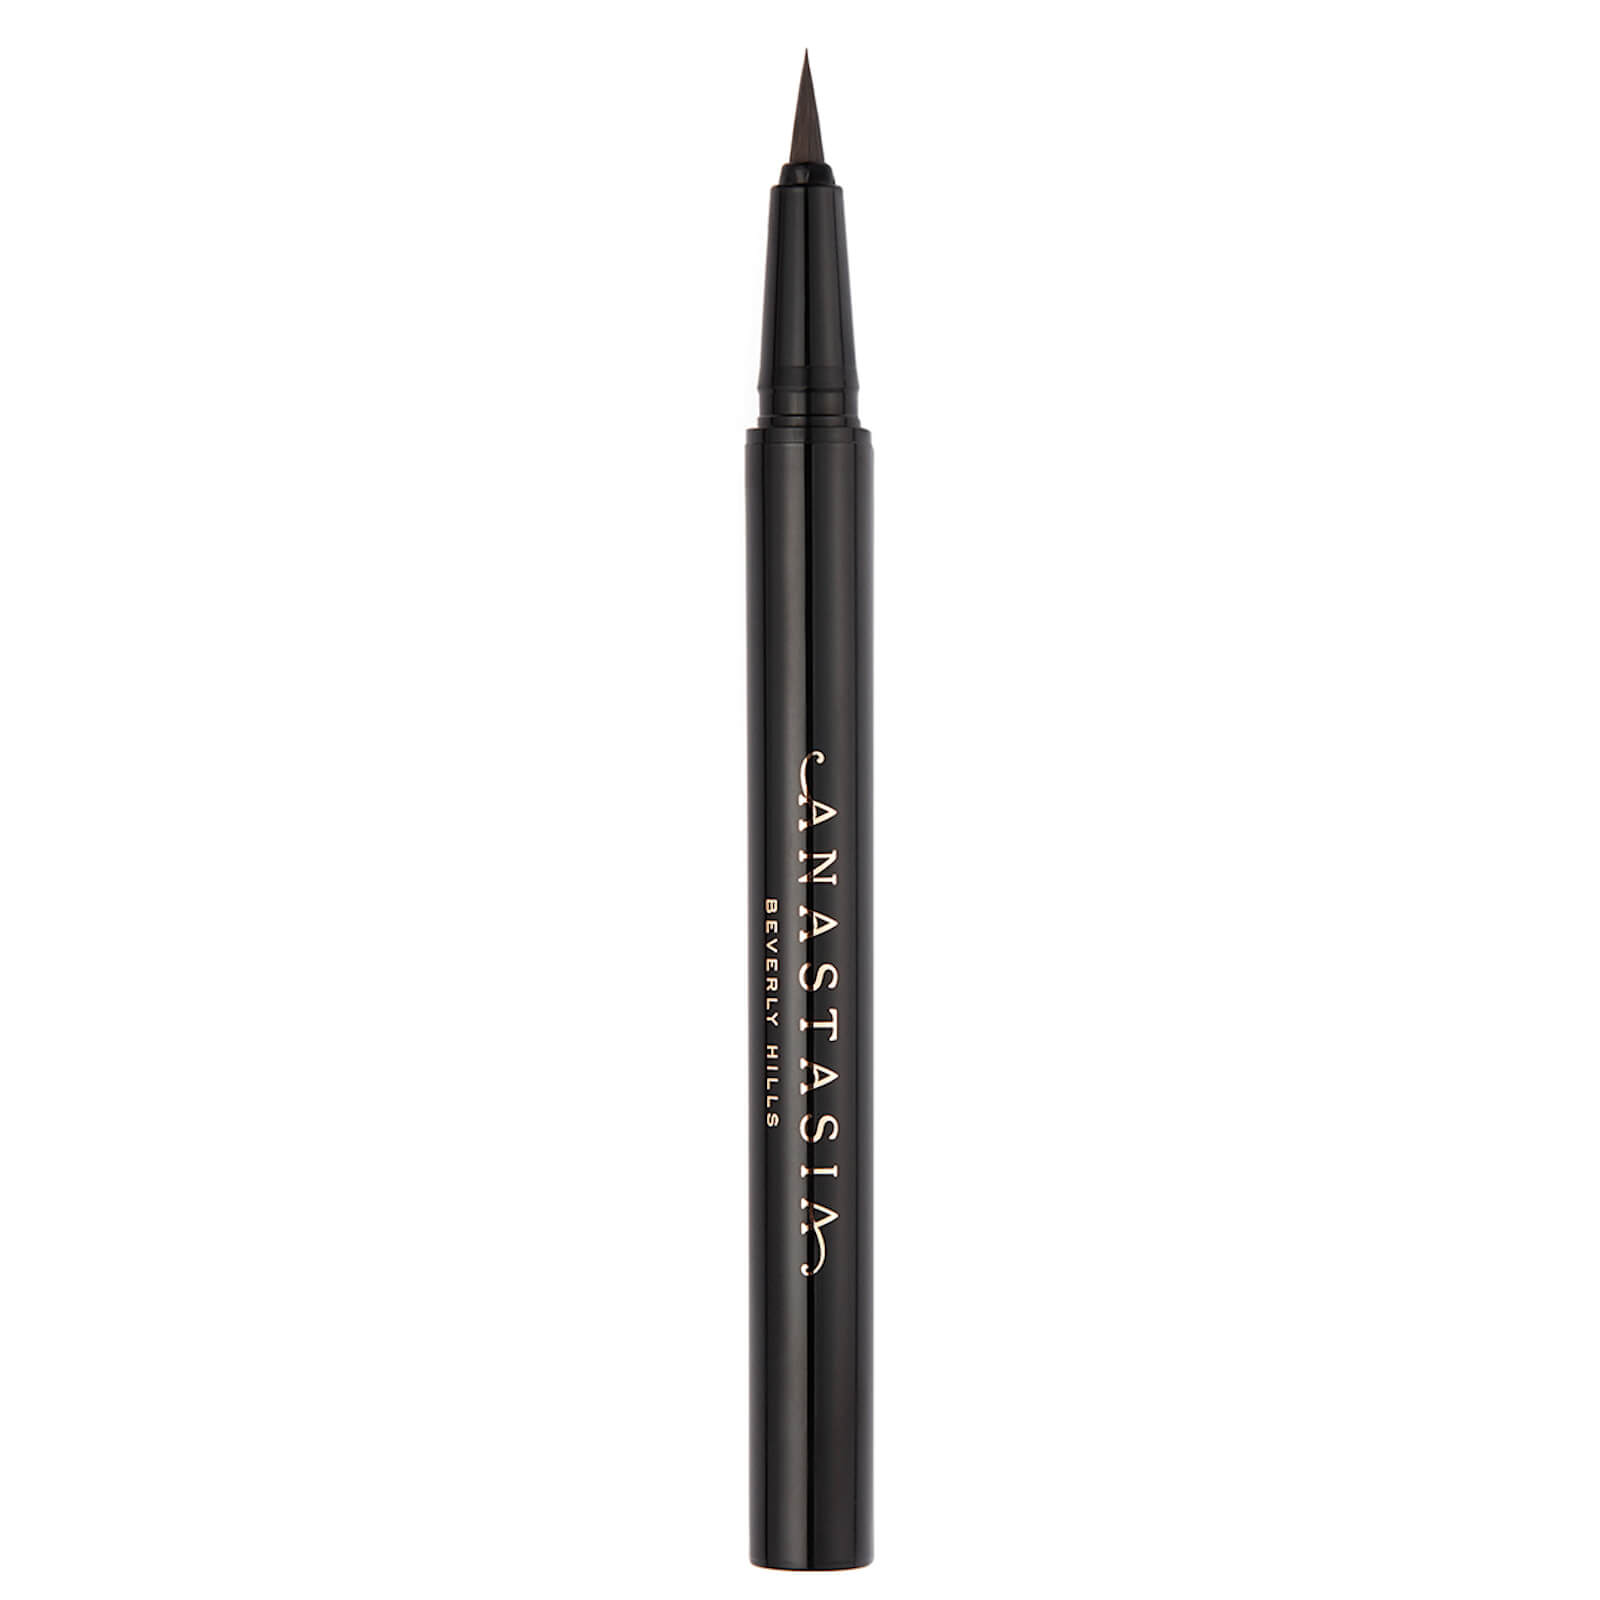 Купить Anastasia Beverly Hills Brow Pen 0.5ml (Various Shades) - Dark Brown